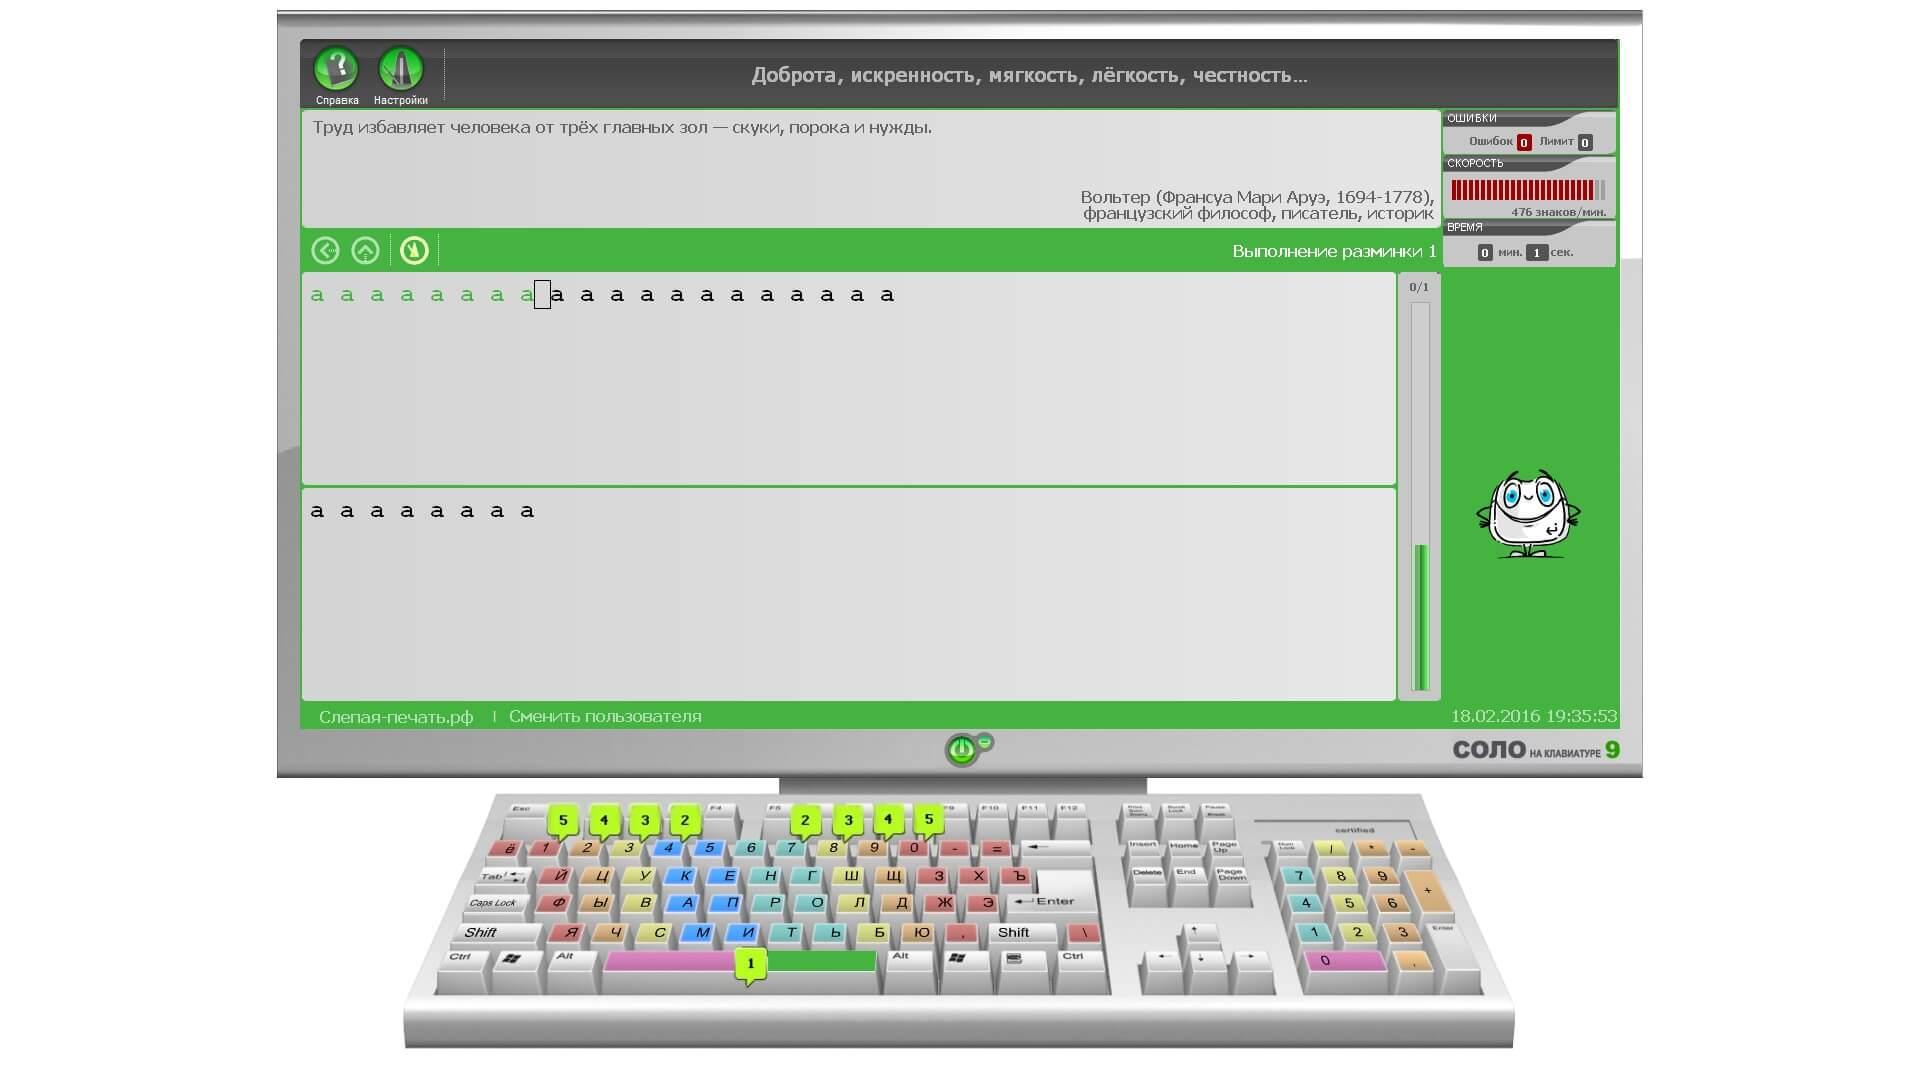 Скриншот клавиатурного тренажера Соло на клавиатуре 9